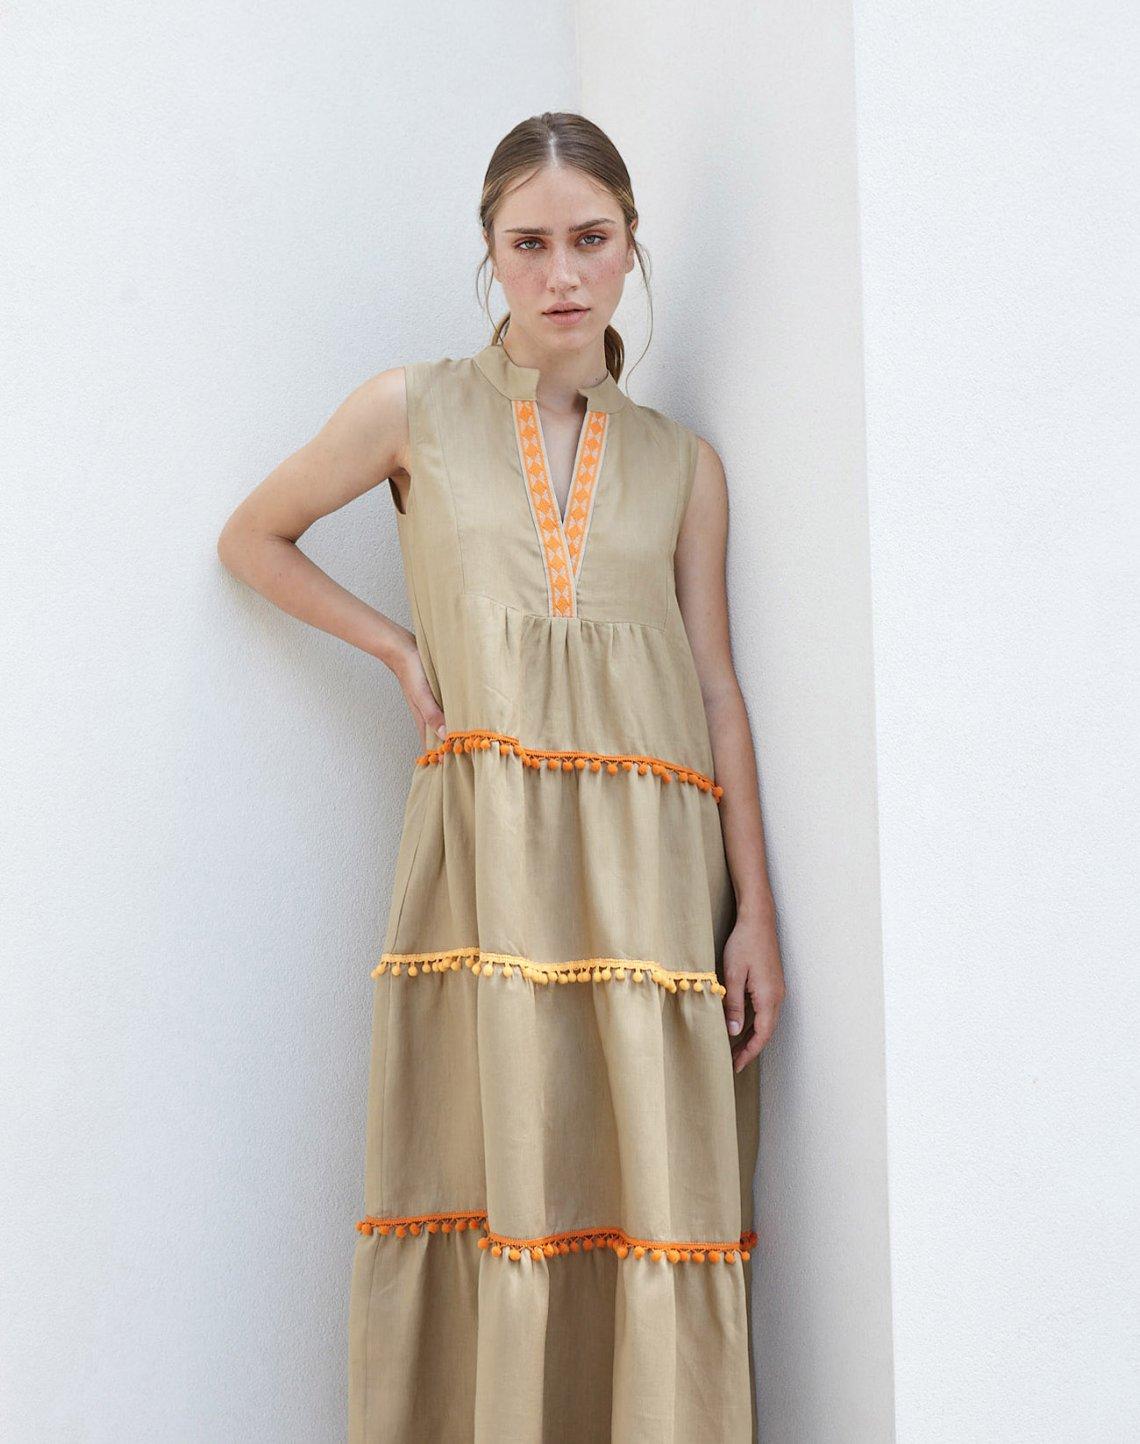 Linen maxi dress with pom poms